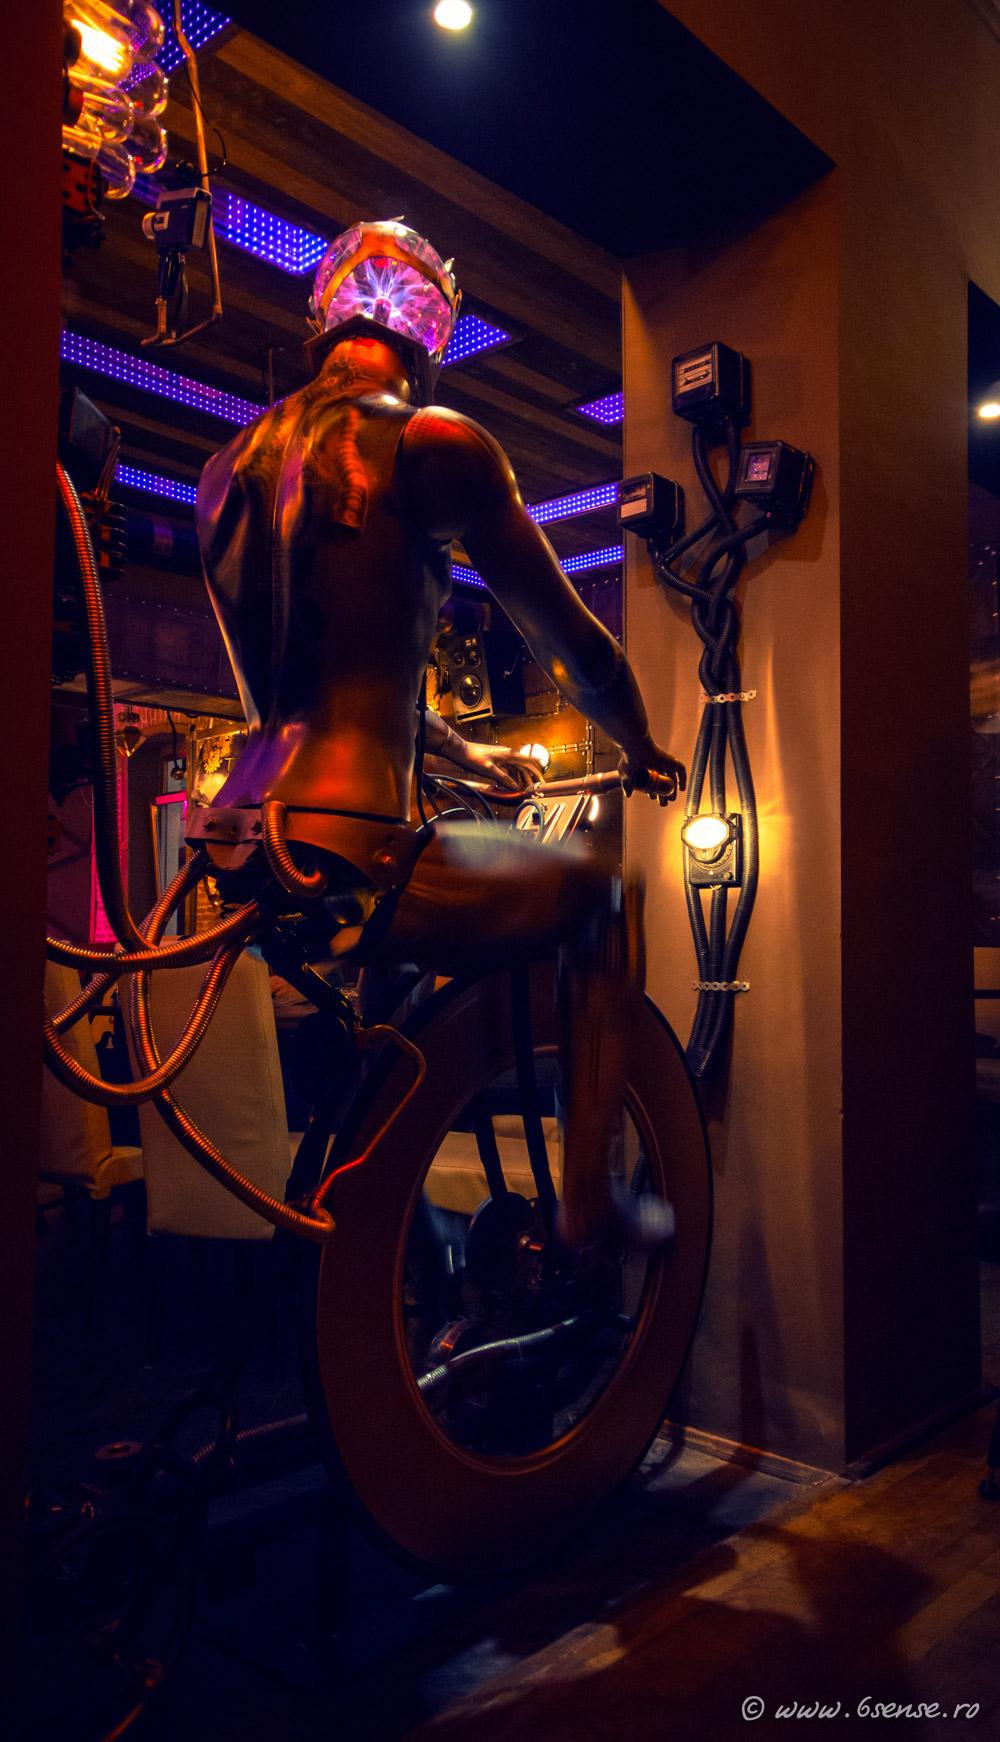 Enigma-cafe-cluj-design-interior (27)